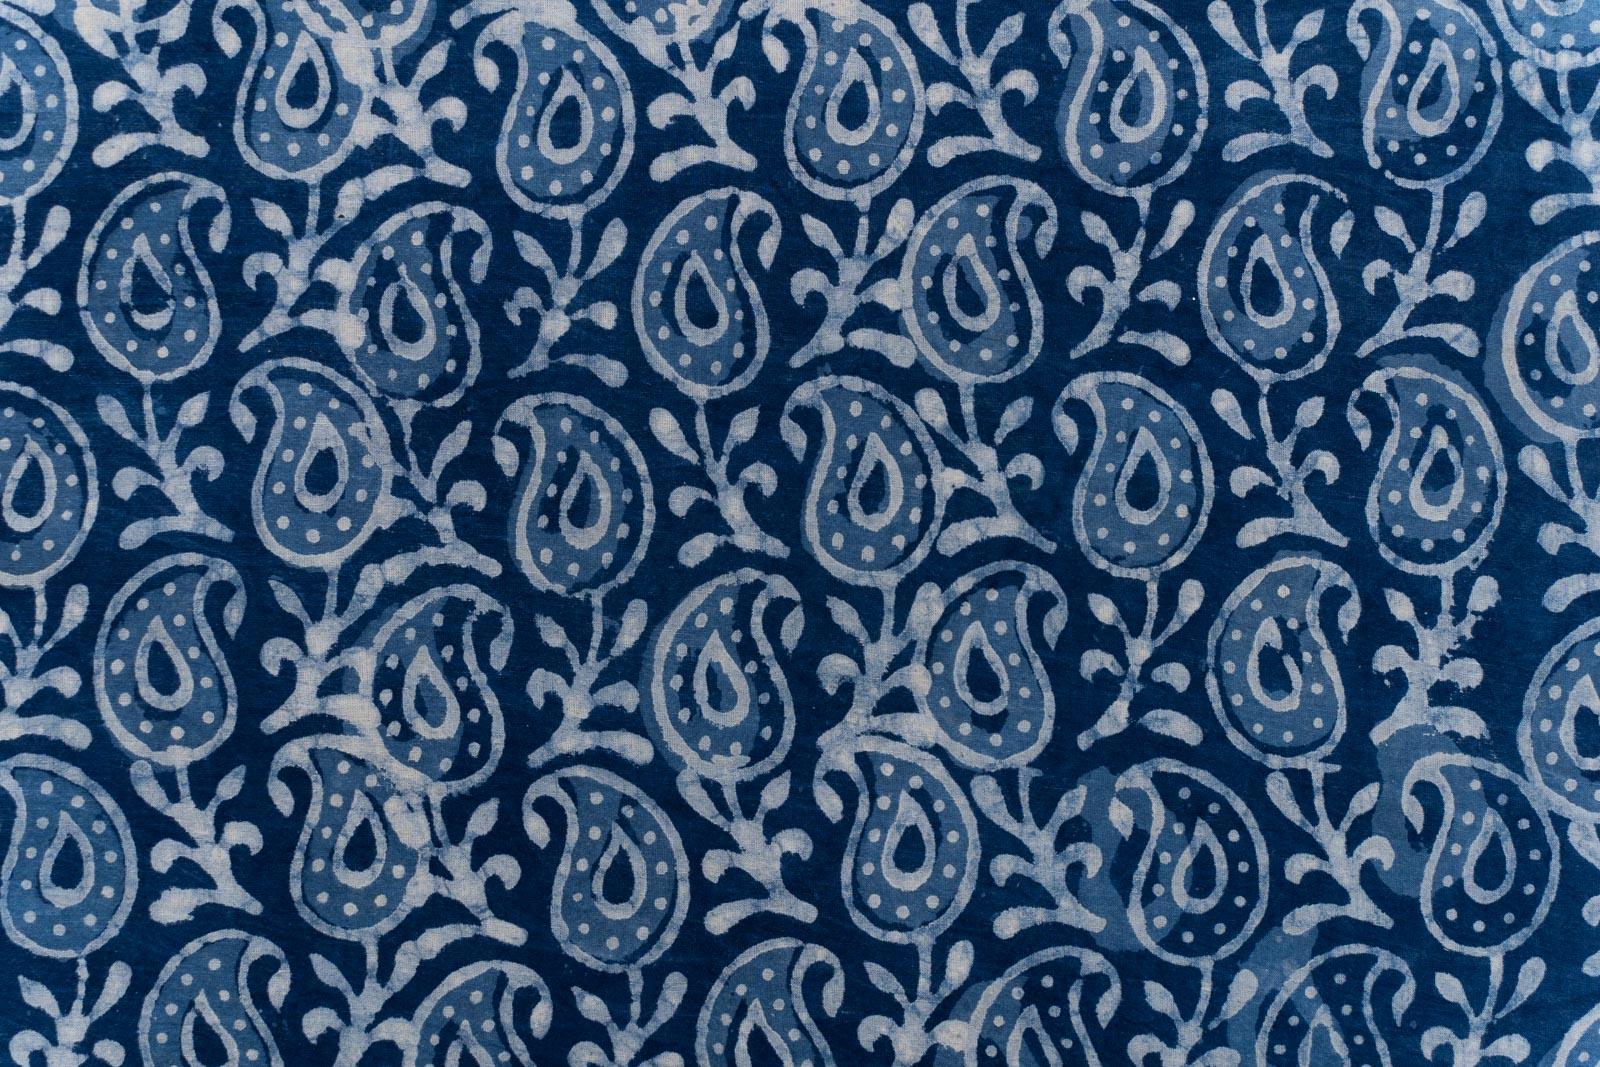 Indigo Paisley Hand Block Printed Fabric